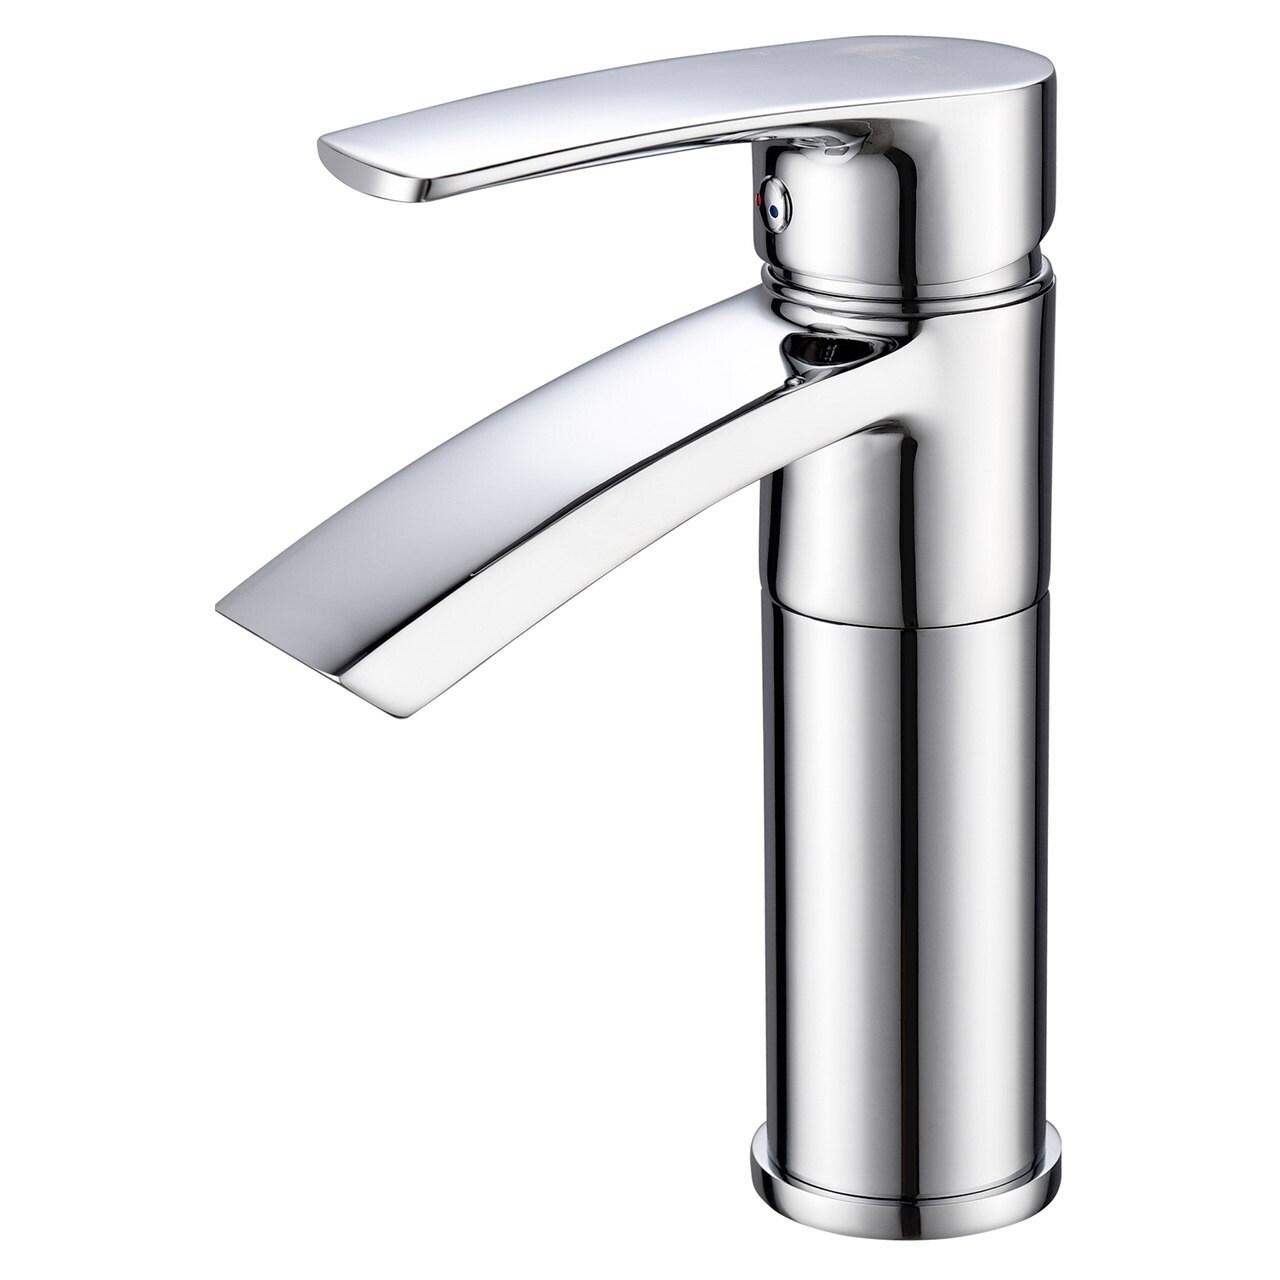 Shop Ariana 7 Single Hole Bathroom Sink Faucet With Swivel Spout